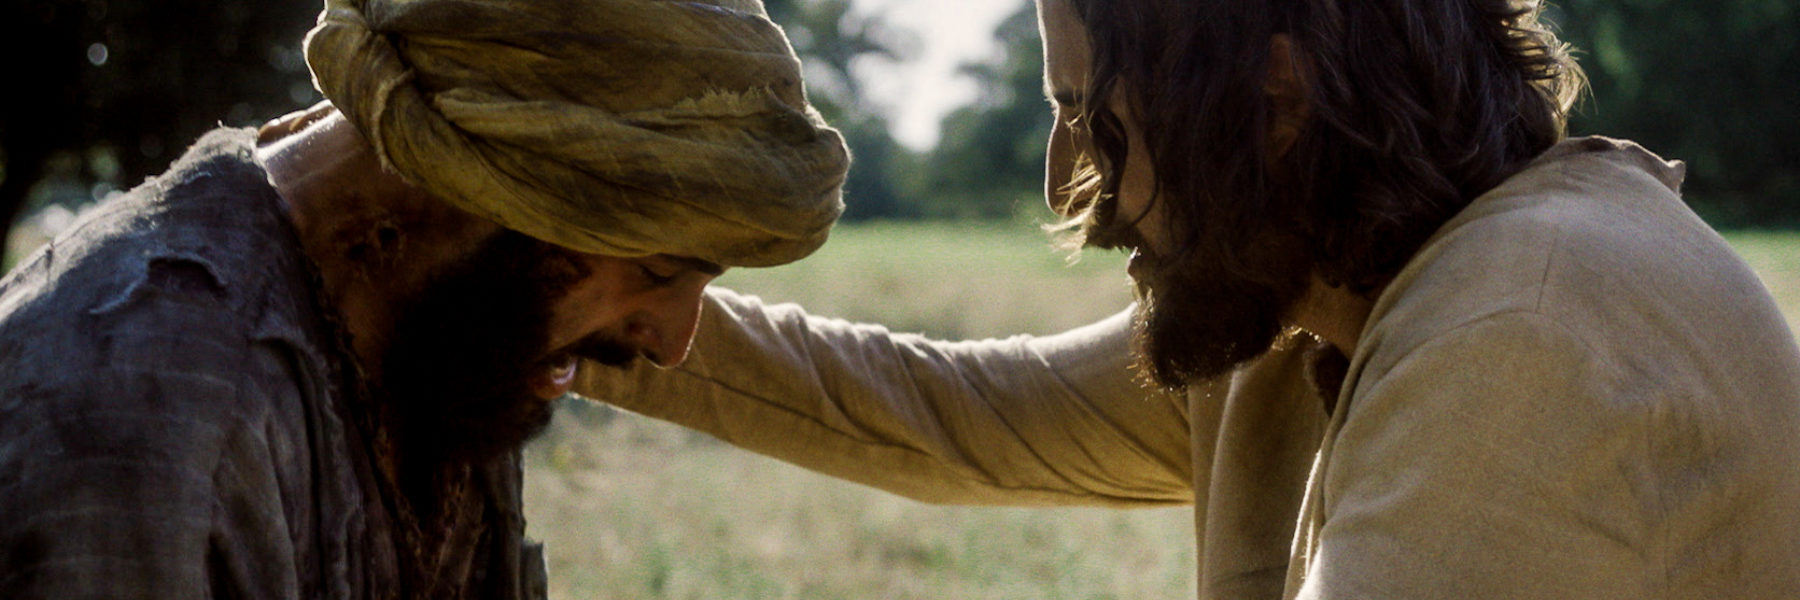 The Chosen Jesus kristen nettserie